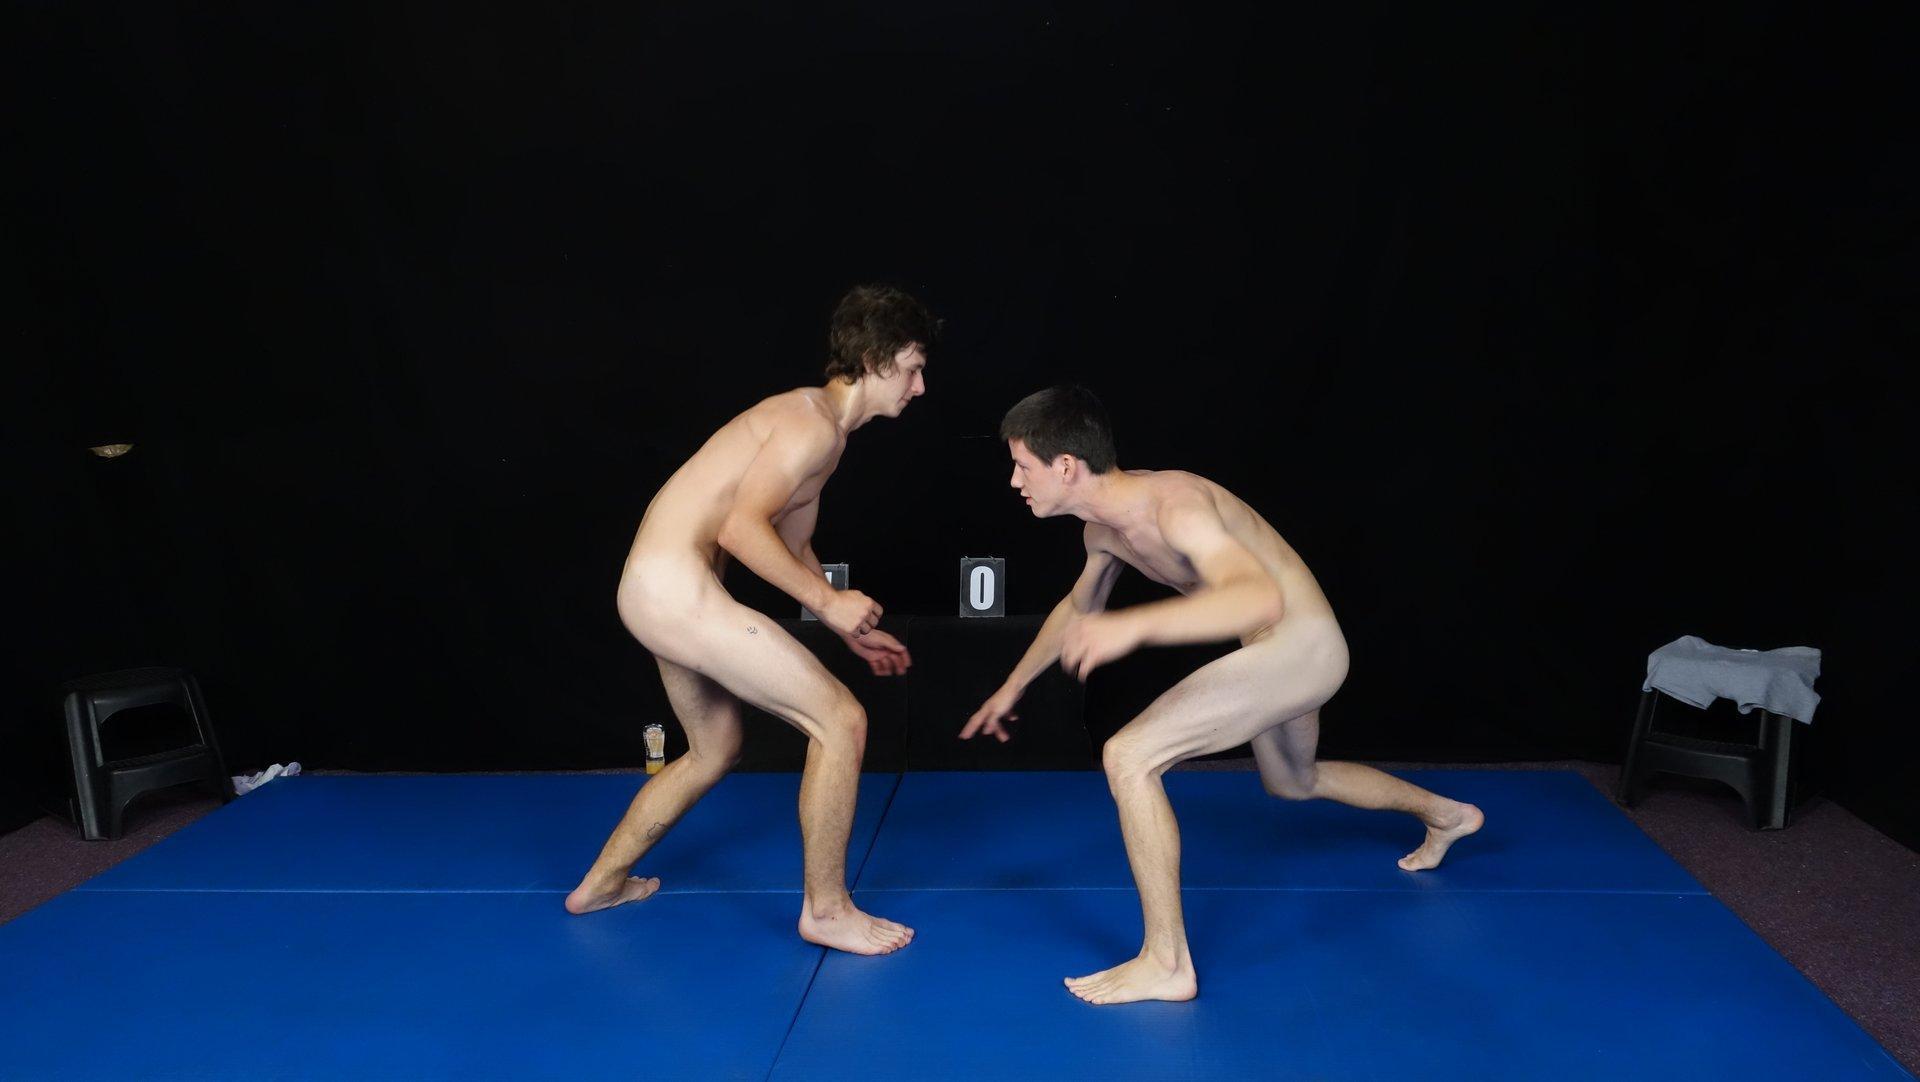 Tono vs Paul - WRESTLING